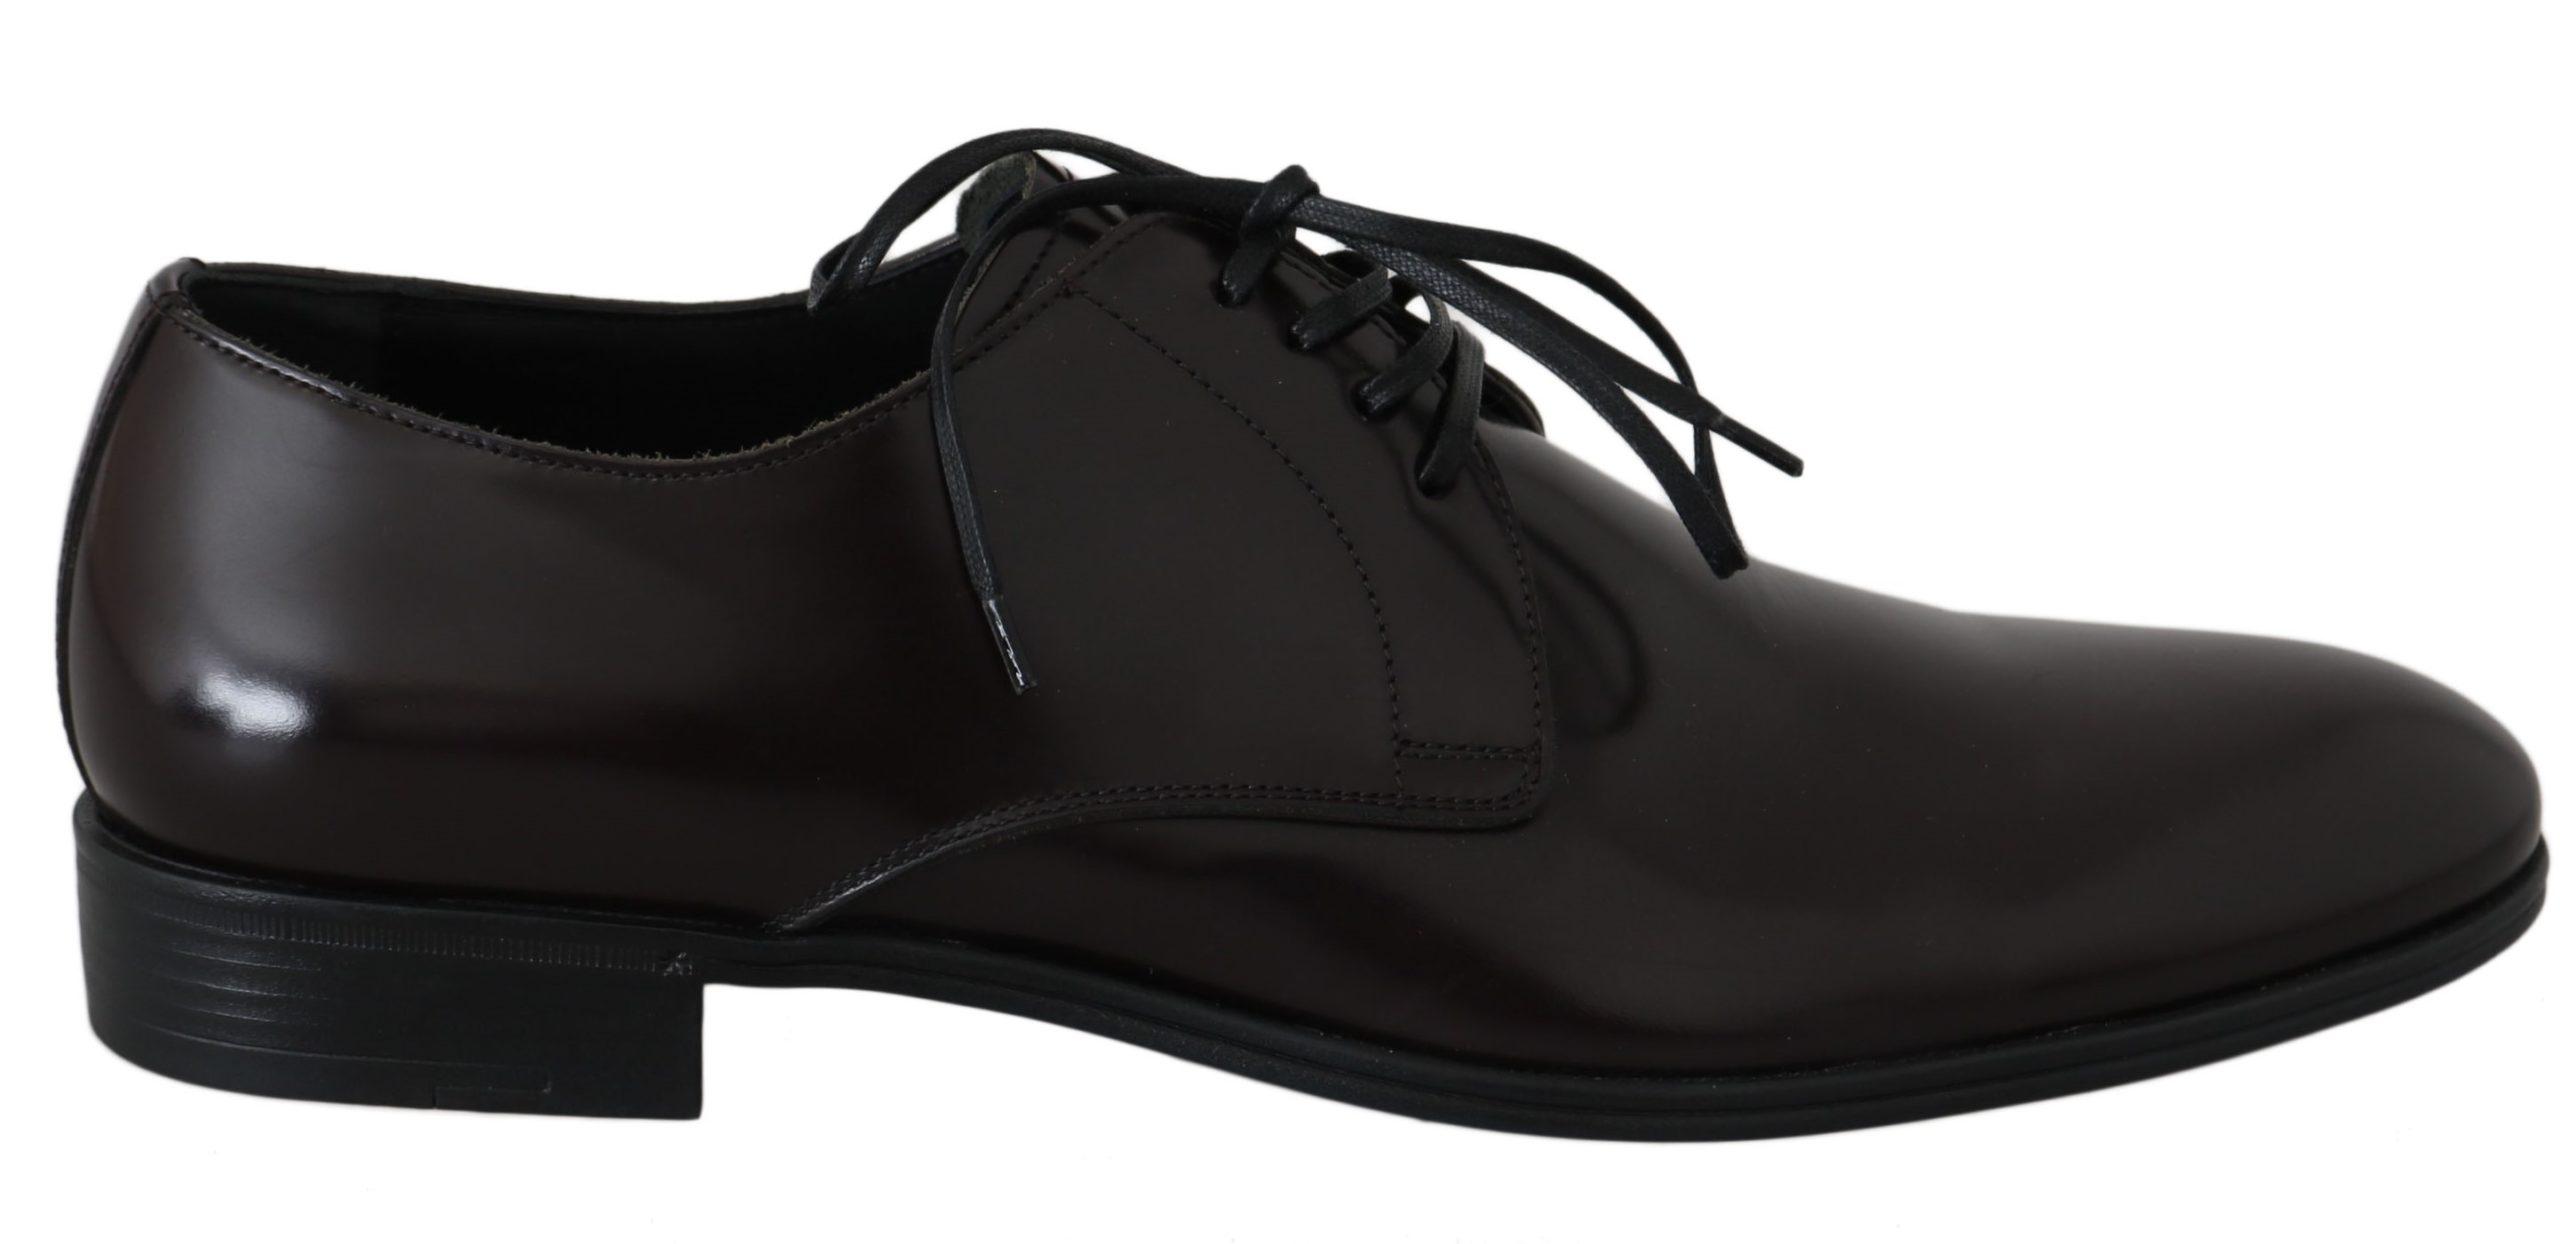 Dolce & Gabbana Men's Shoes Brown MV2351 - EU39/US6